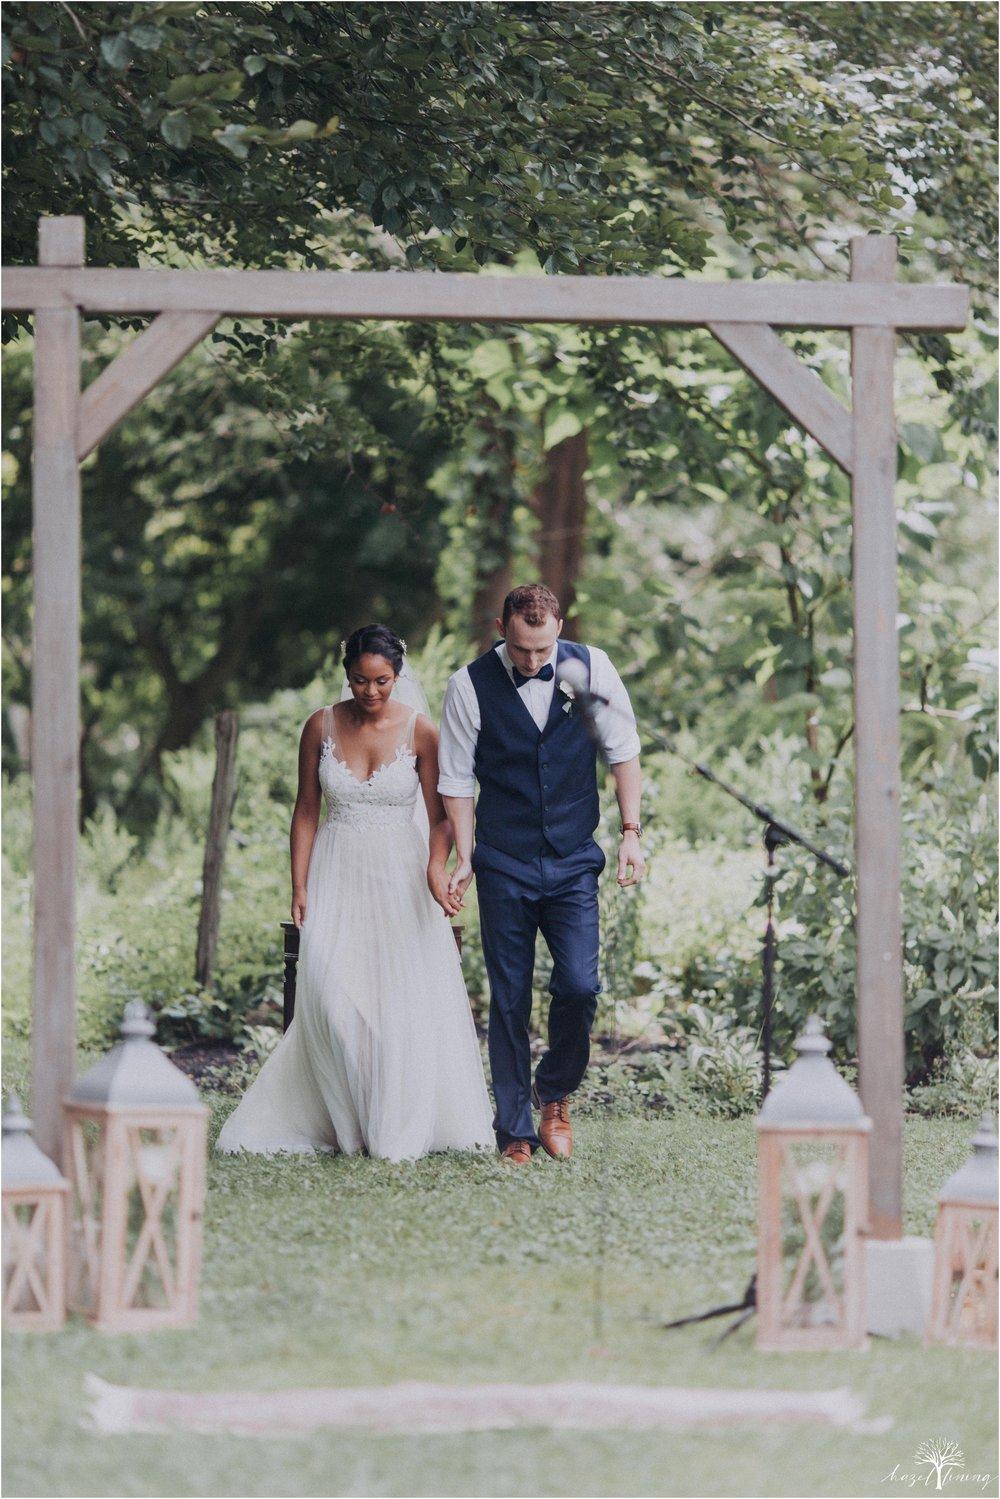 mariah-kreyling-samuel-sherratt-sherrattwiththeworld-peirce-farm-at-witch-hill-boston-massachusetts-wedding-photography-hazel-lining-travel-wedding-elopement-photography_0096.jpg